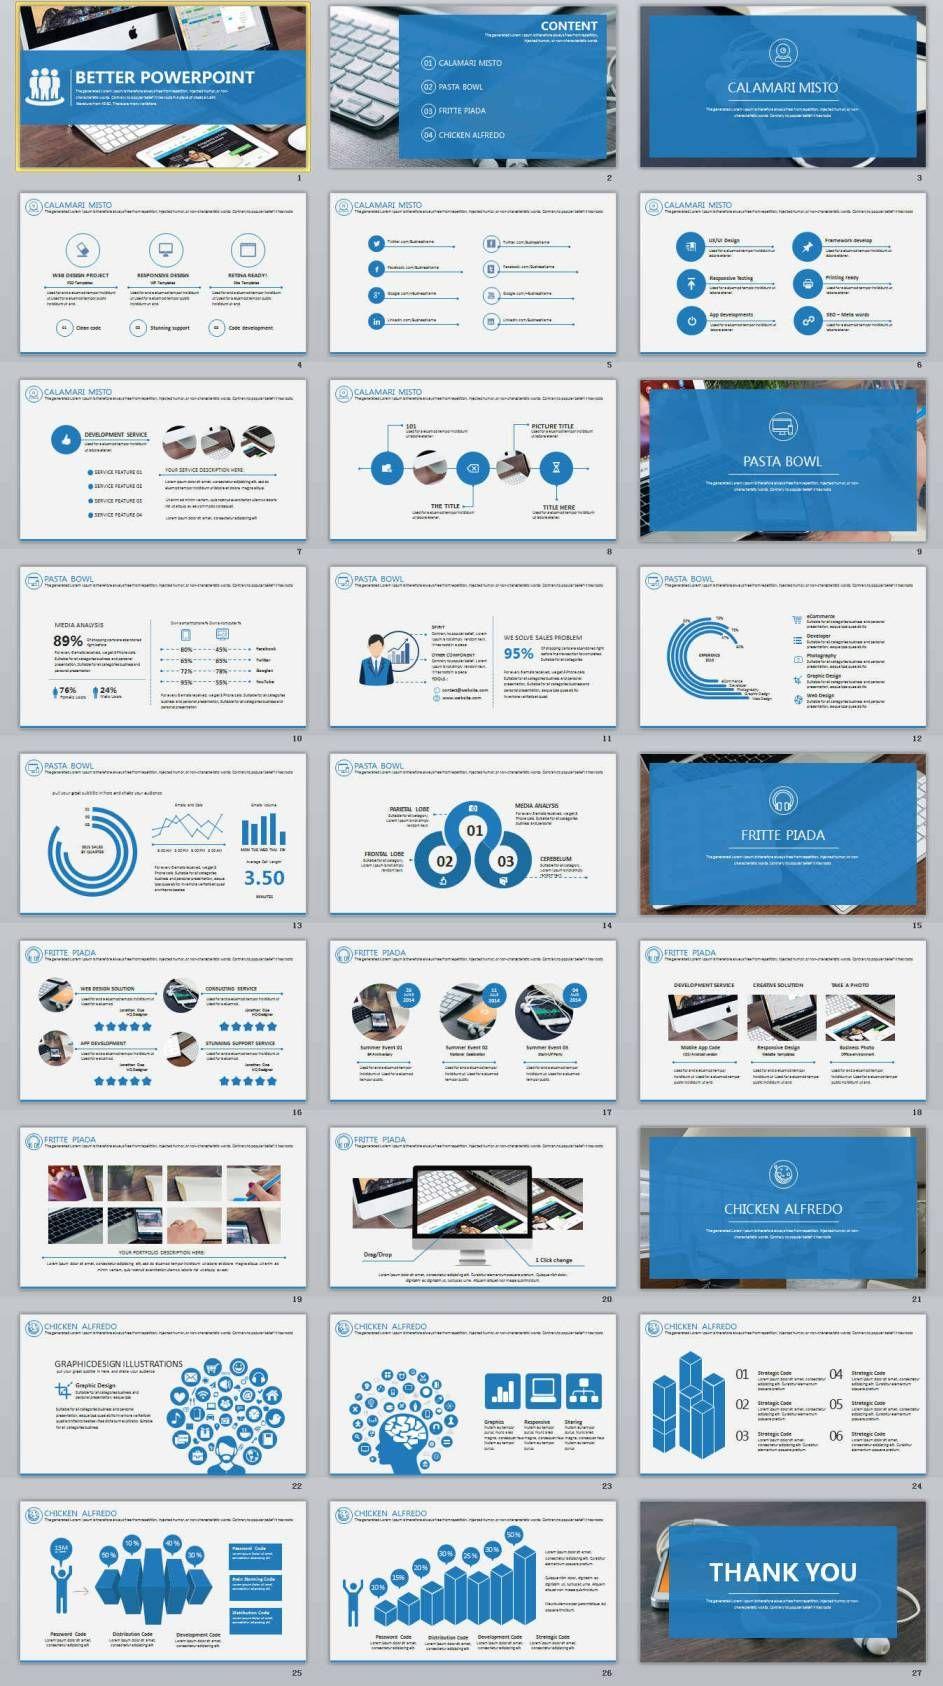 27 better blue professional powerpoint templates powerpoint 27 better blue professional powerpoint templates powerpoint templates and keynote templates toneelgroepblik Image collections